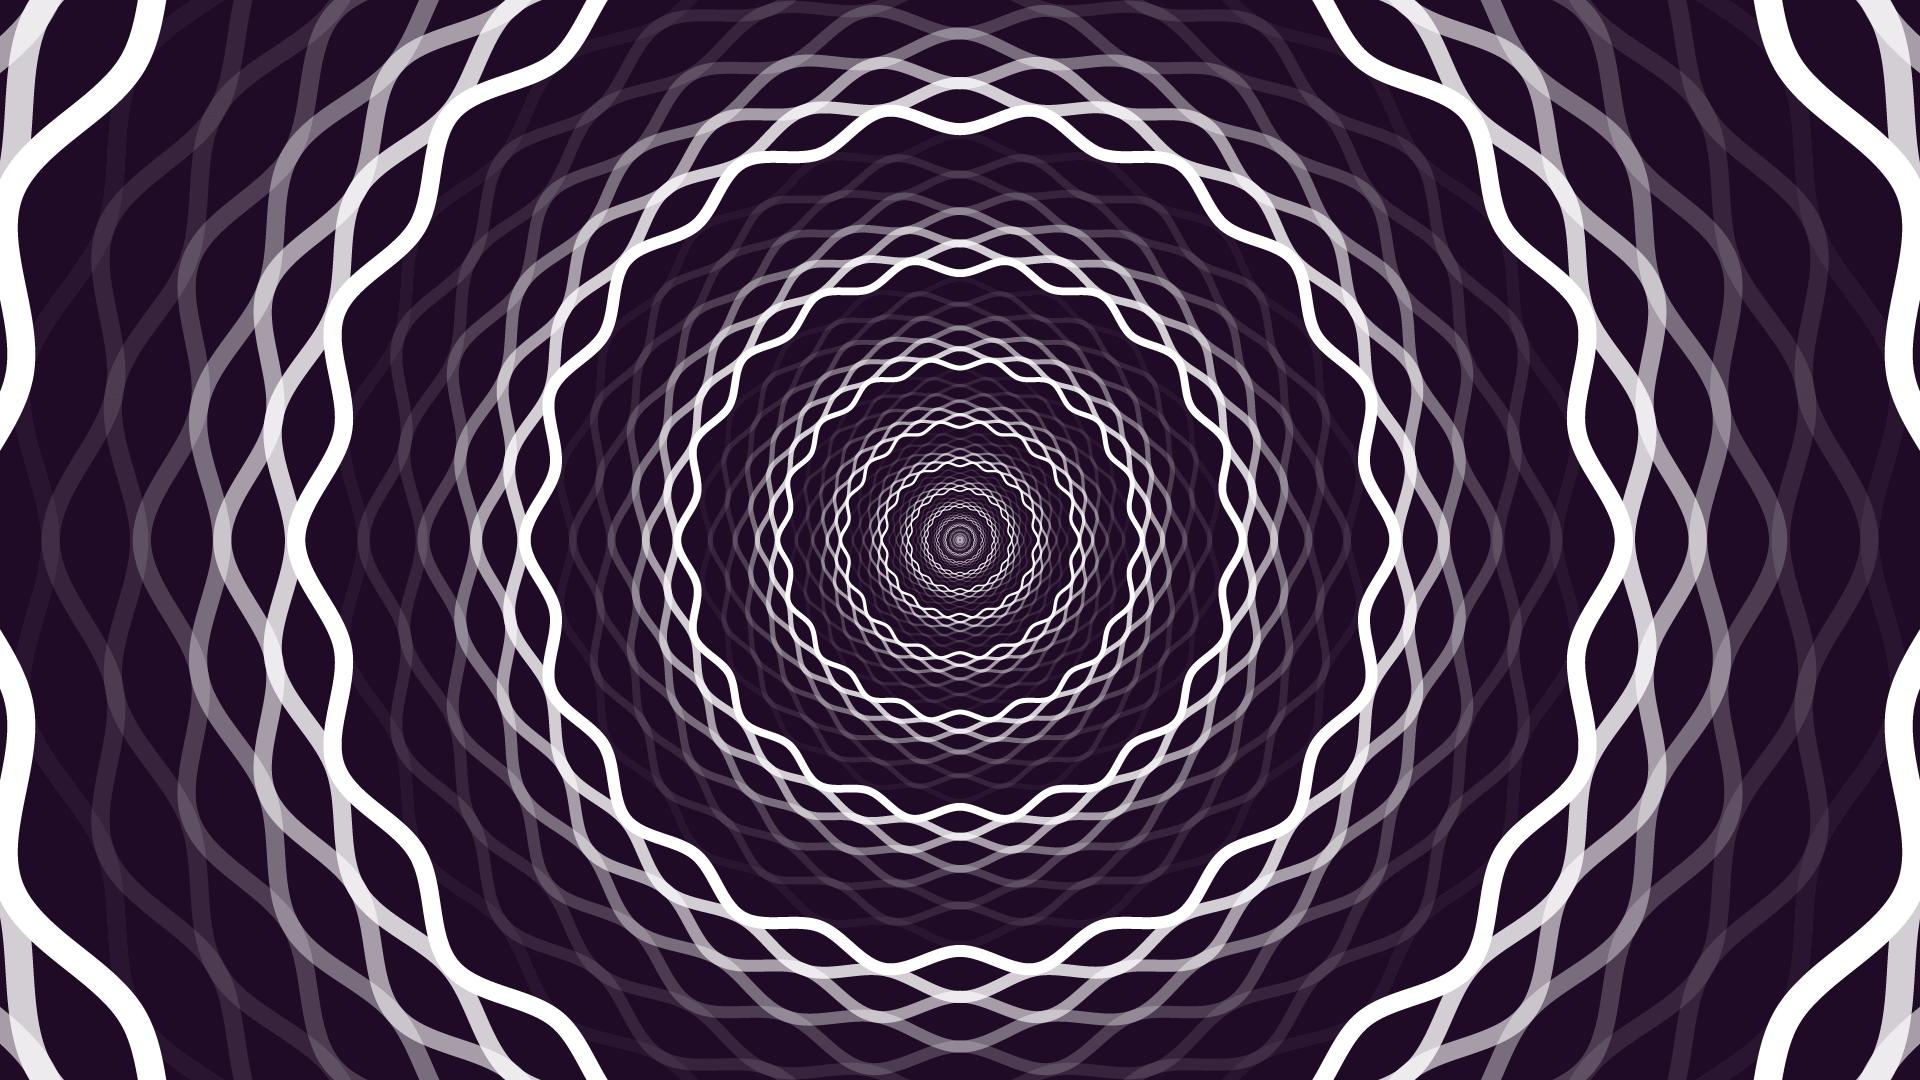 080_Website Project Black Holes_Kurzgesagt Project Pic 2